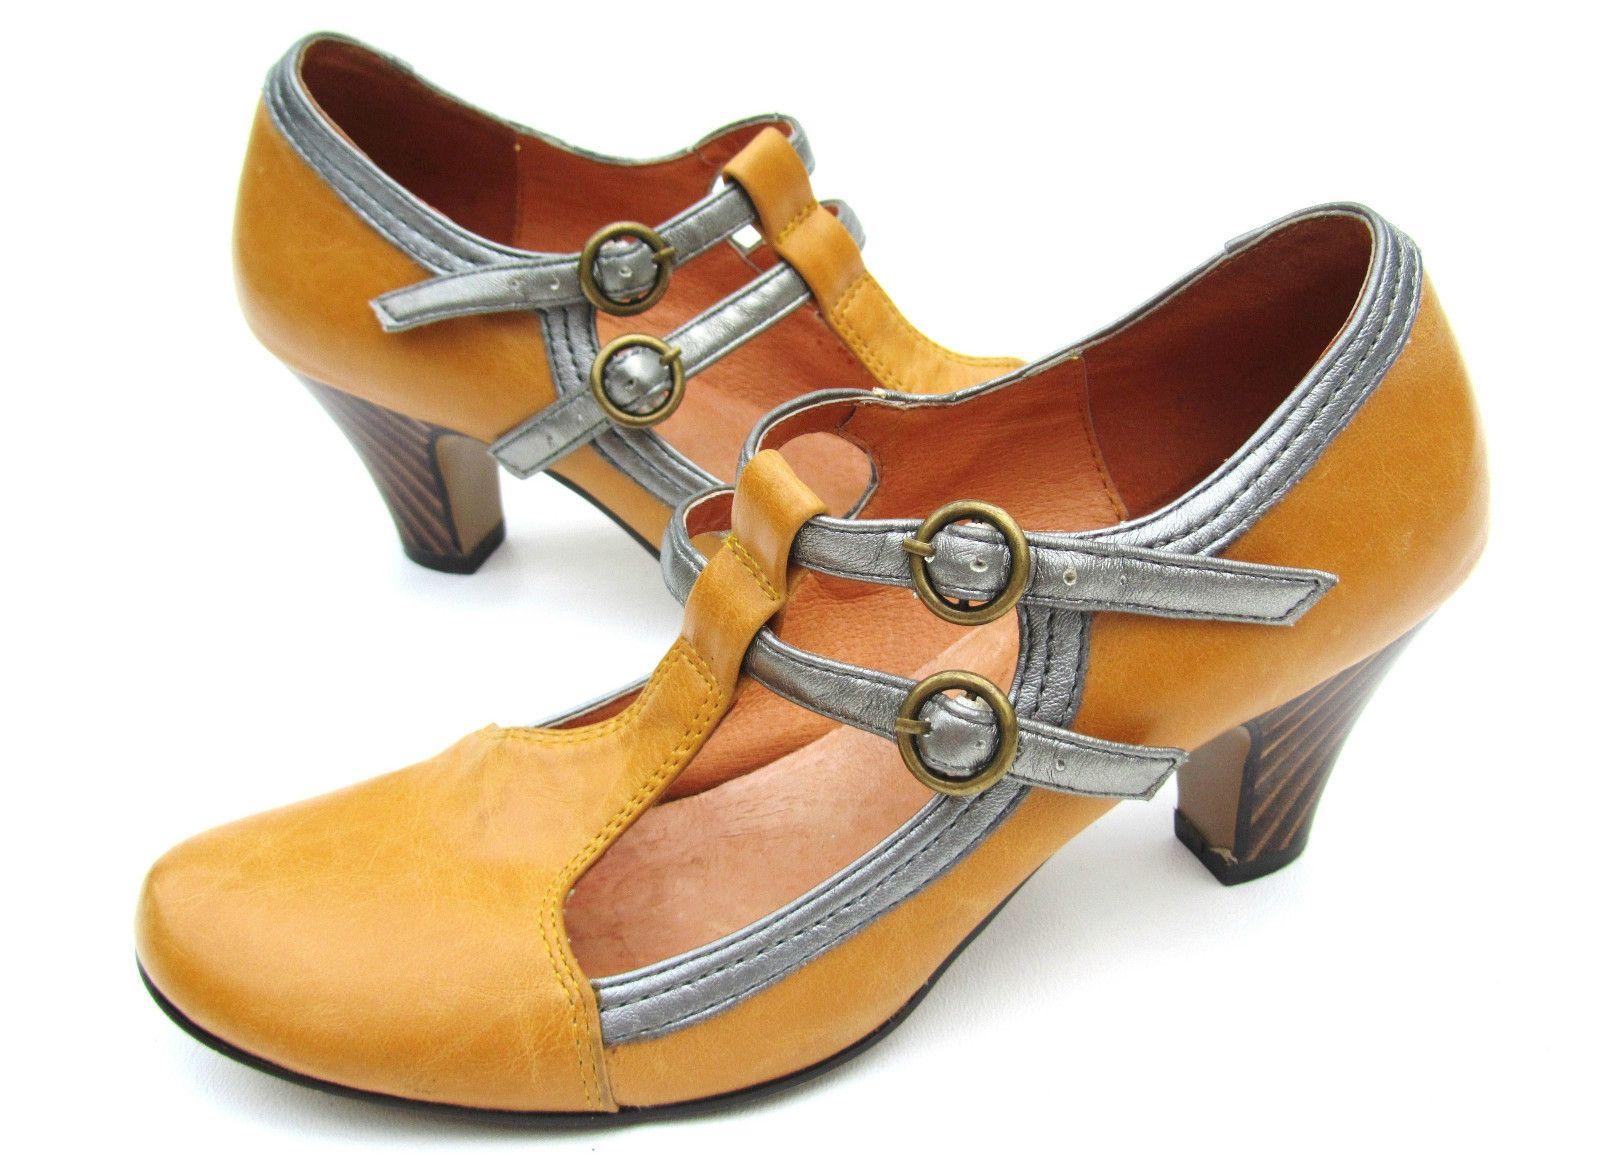 Navid O Nadia EU 37 US 6.5 Pumps Yellow T Strap Mary Jane Striped Heel Leather | eBay